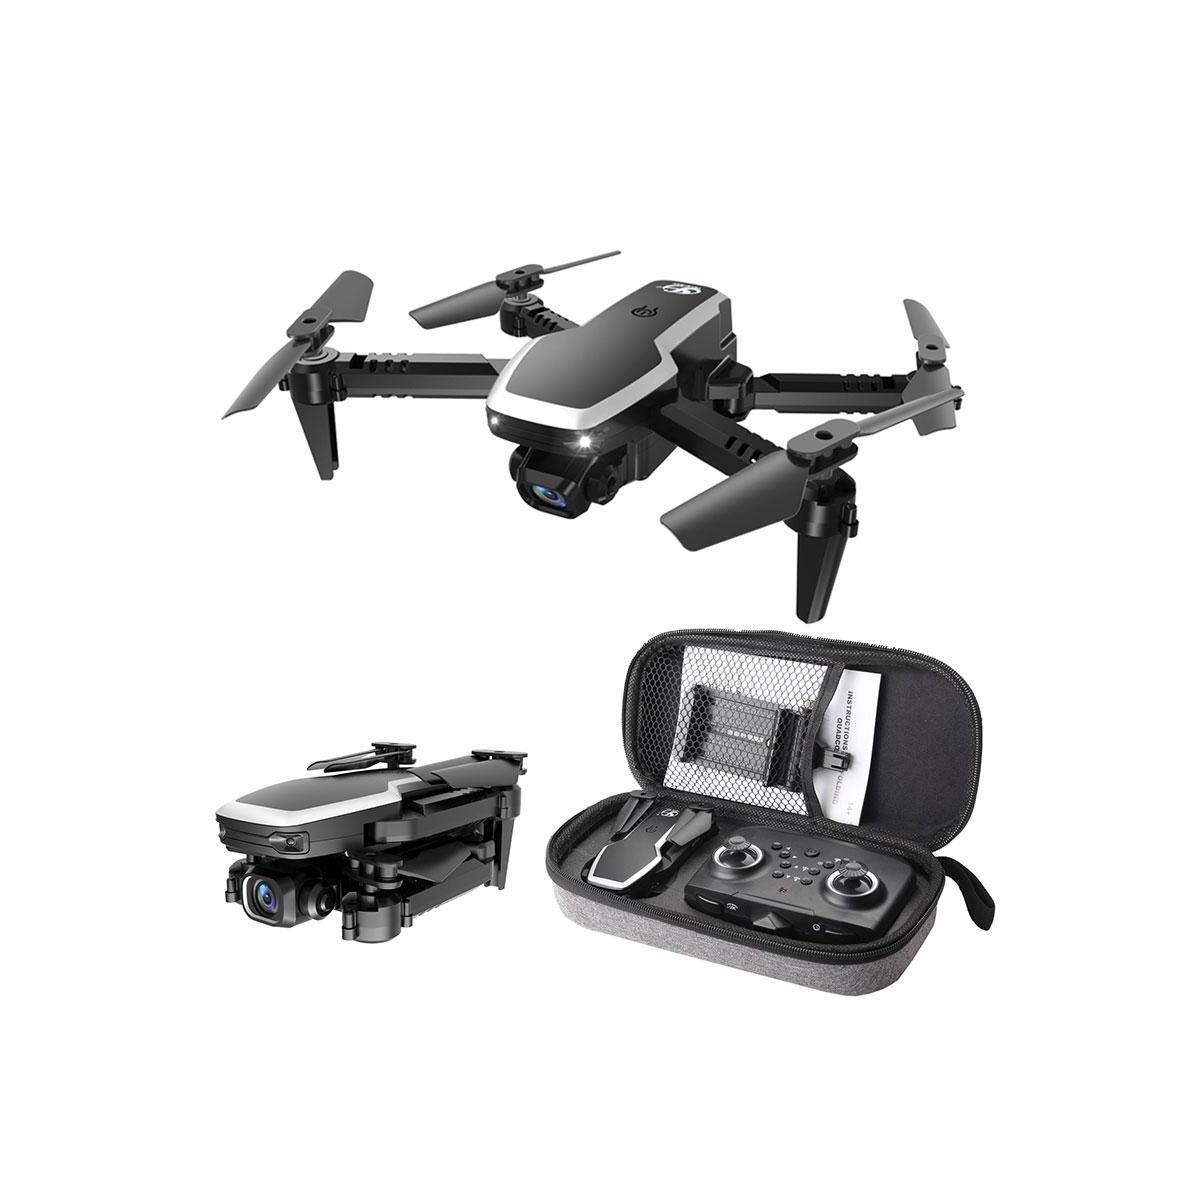 Mini Drone RC Quadcopter Foldable Drones With Camera, 4K Dual Camera 2B